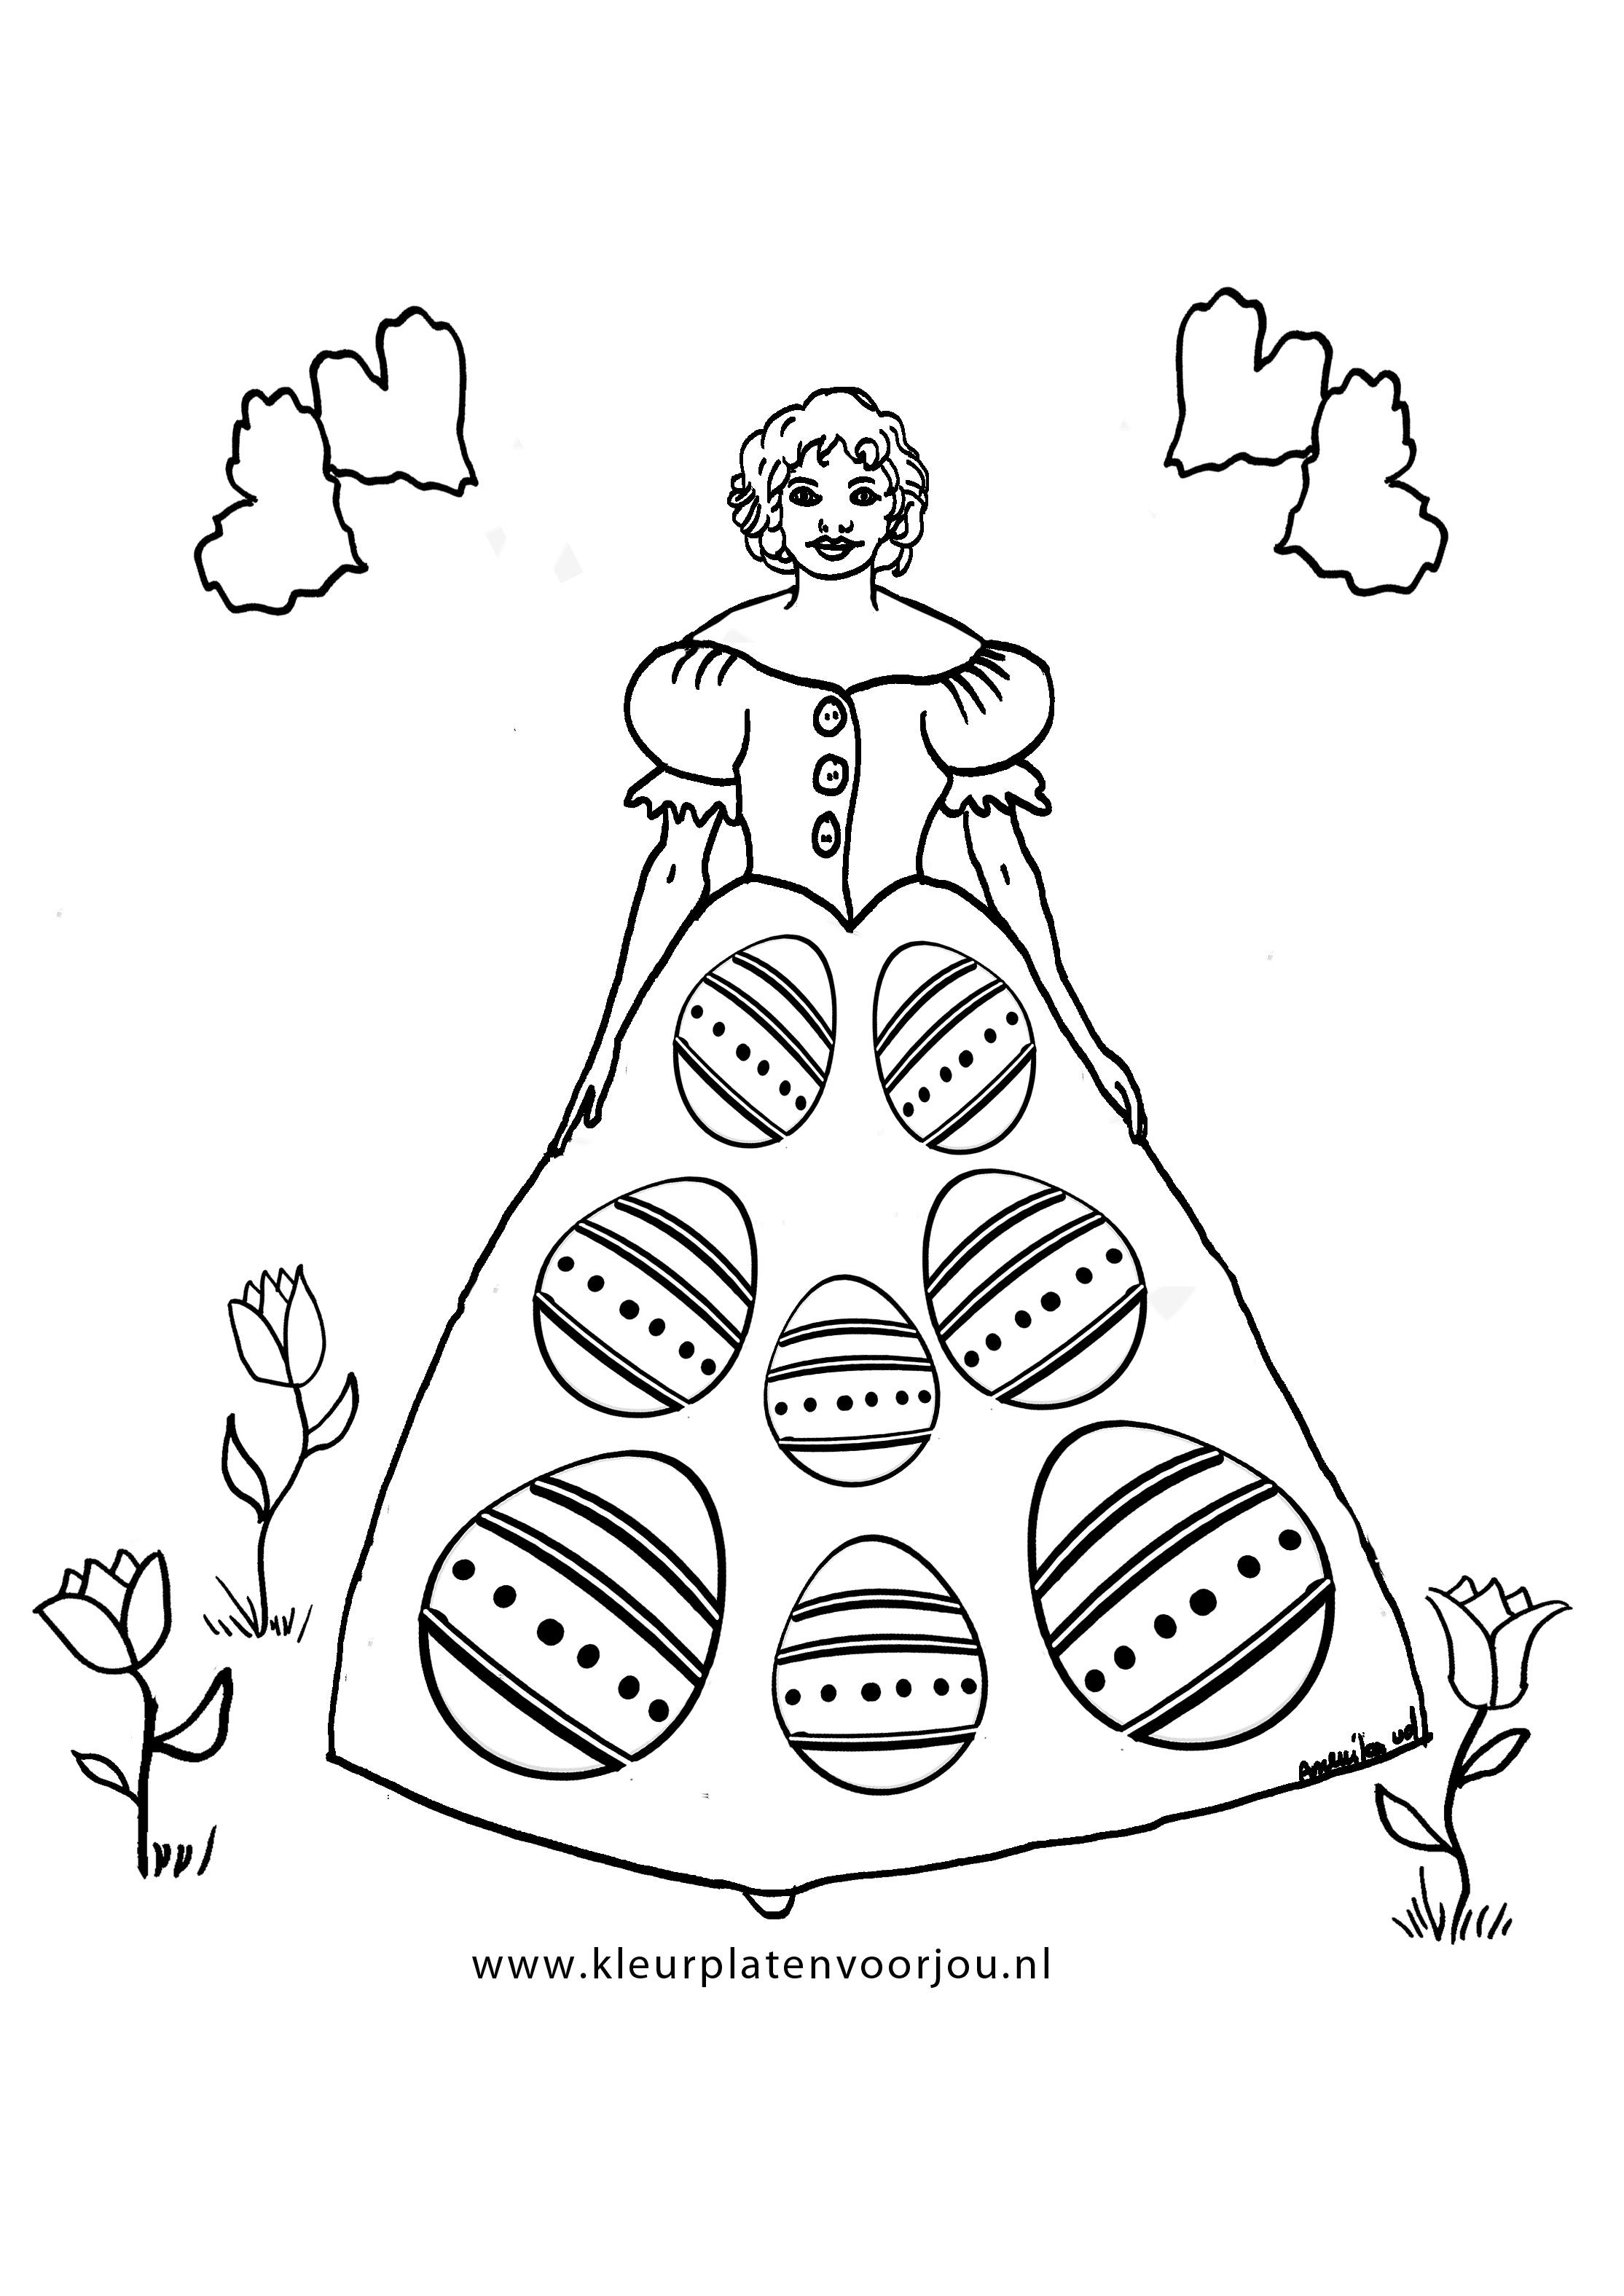 Kleurplaten Prinses Lillifee.Geniaal Kleurplaat Prinses Lillifee En De Kleine Eenhoorn Klupaats